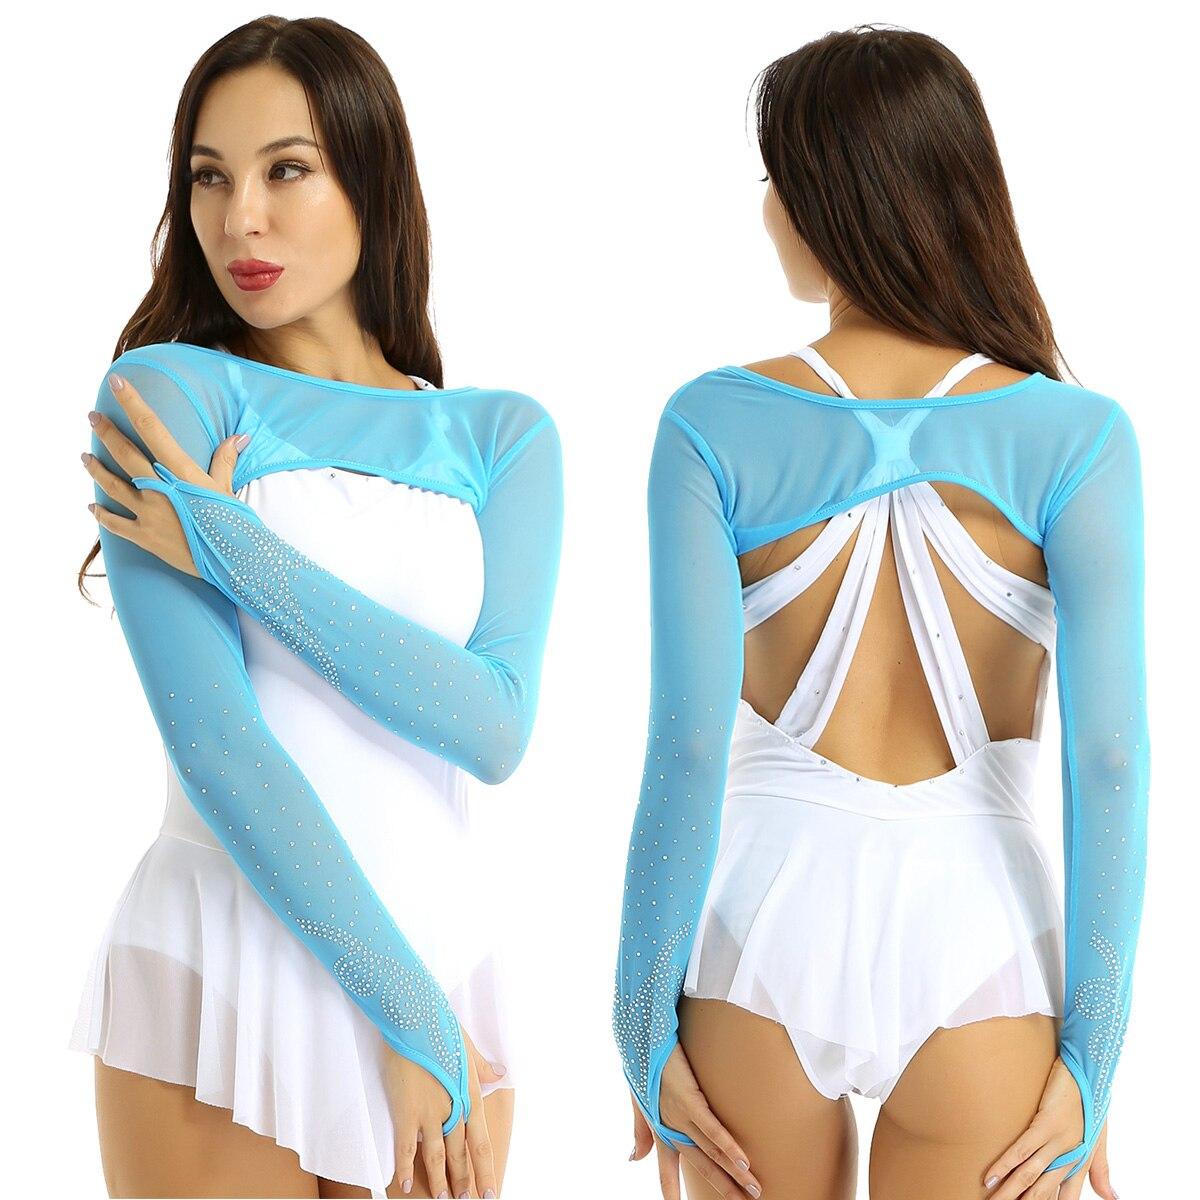 ChicTry Women Sheer Mesh Long Sleeves Rhinestones Half Shrug Wrap Crop Tops For Performance Figure Skating Dress Dance Cover-Ups